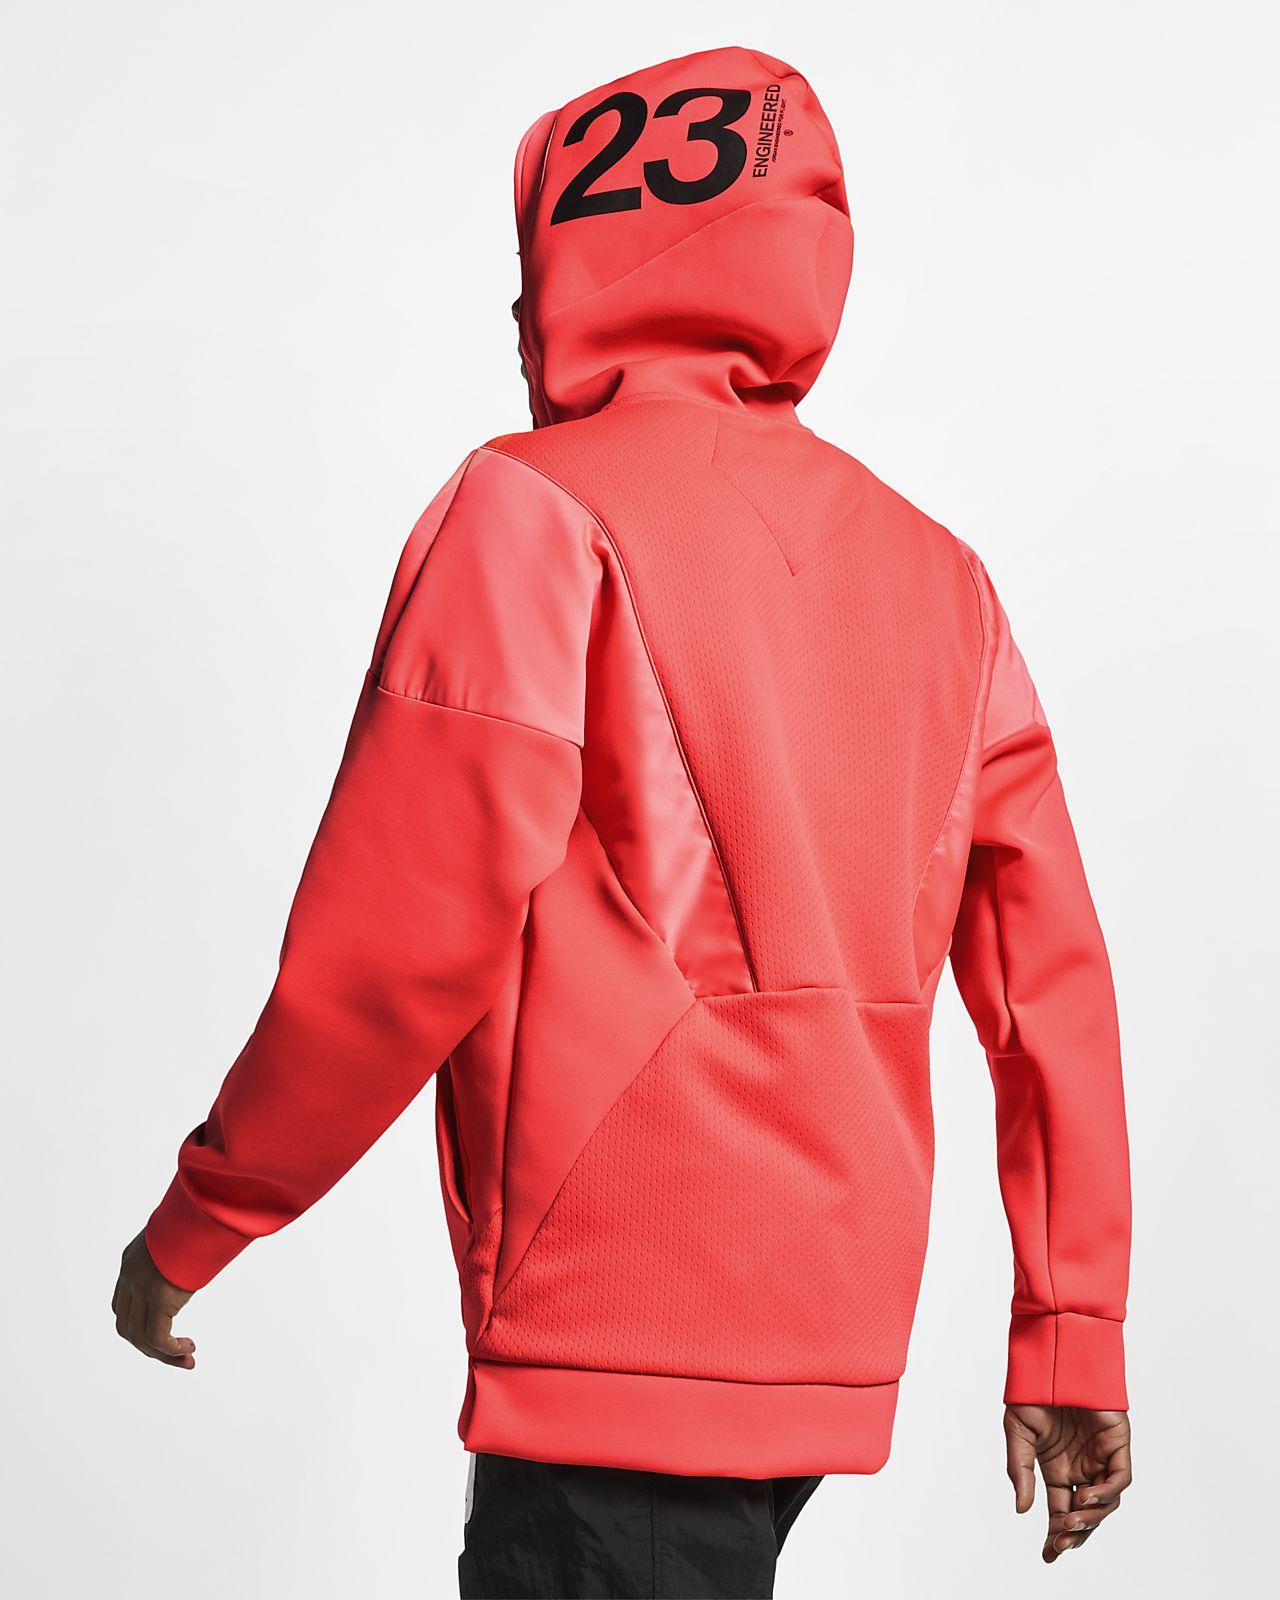 2ff4b28d86b1 Jordan 23E Flight Tech Lite Men s Full-Zip Hoodie. Nike.com CA